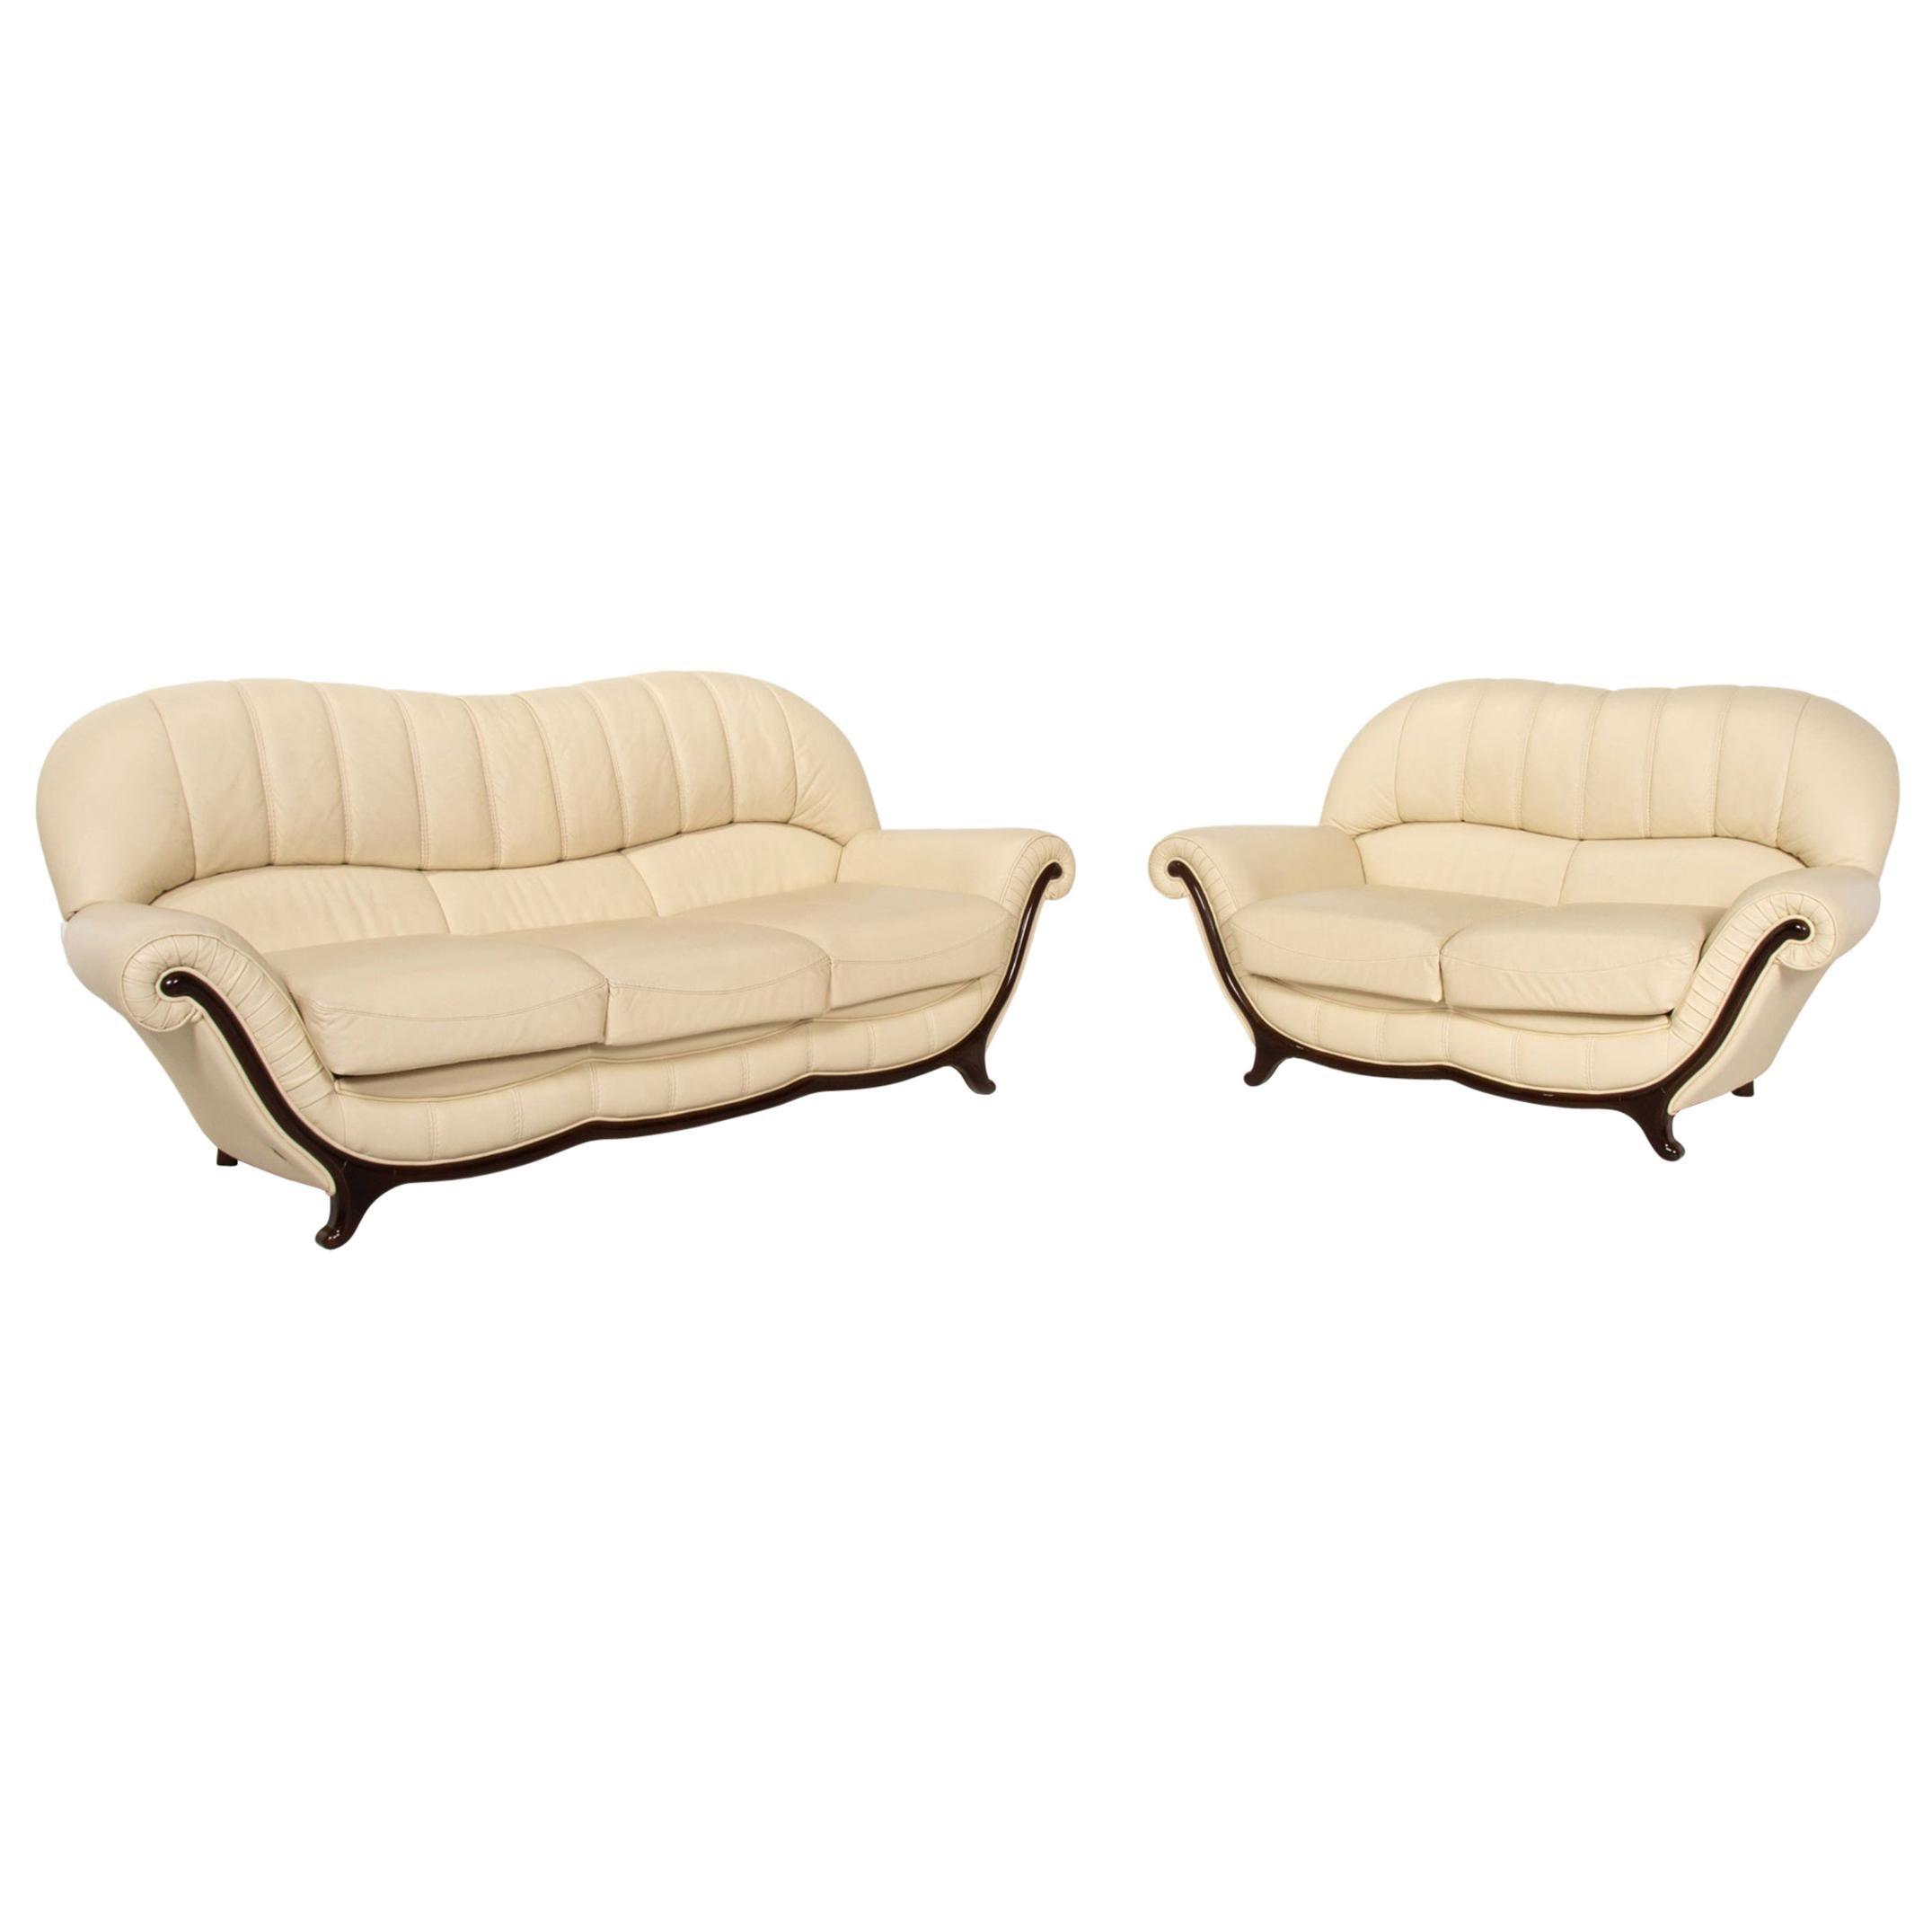 Nieri Leather Wood Sofa Set Cream 1 Three-Seater 1 Two-Seater